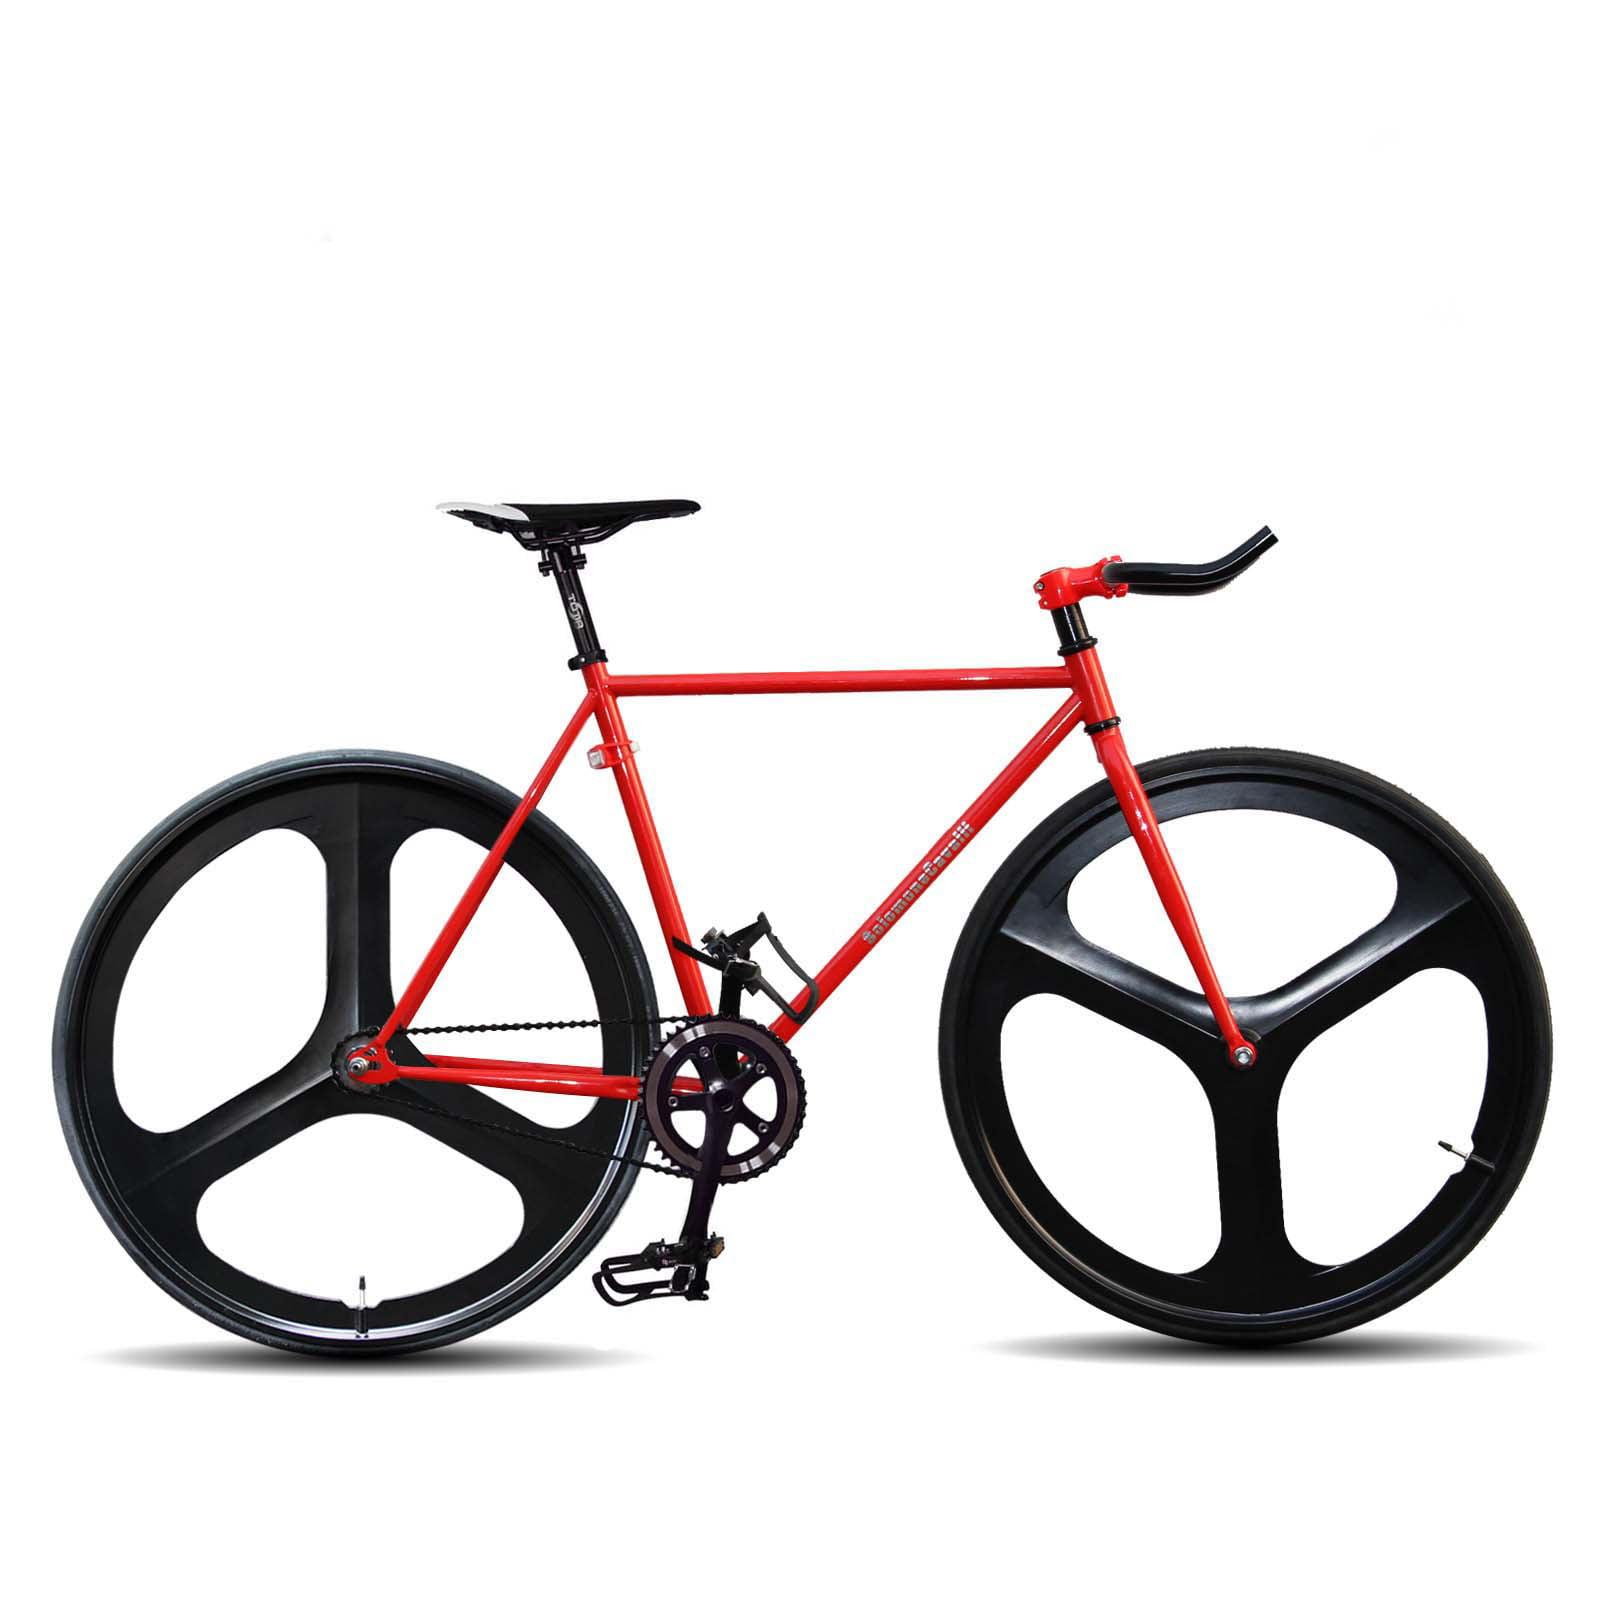 SC Fixed Gear 700c Tri Spoke Rim Front Rear Single Speed Fixie Bicycle Wheel Set